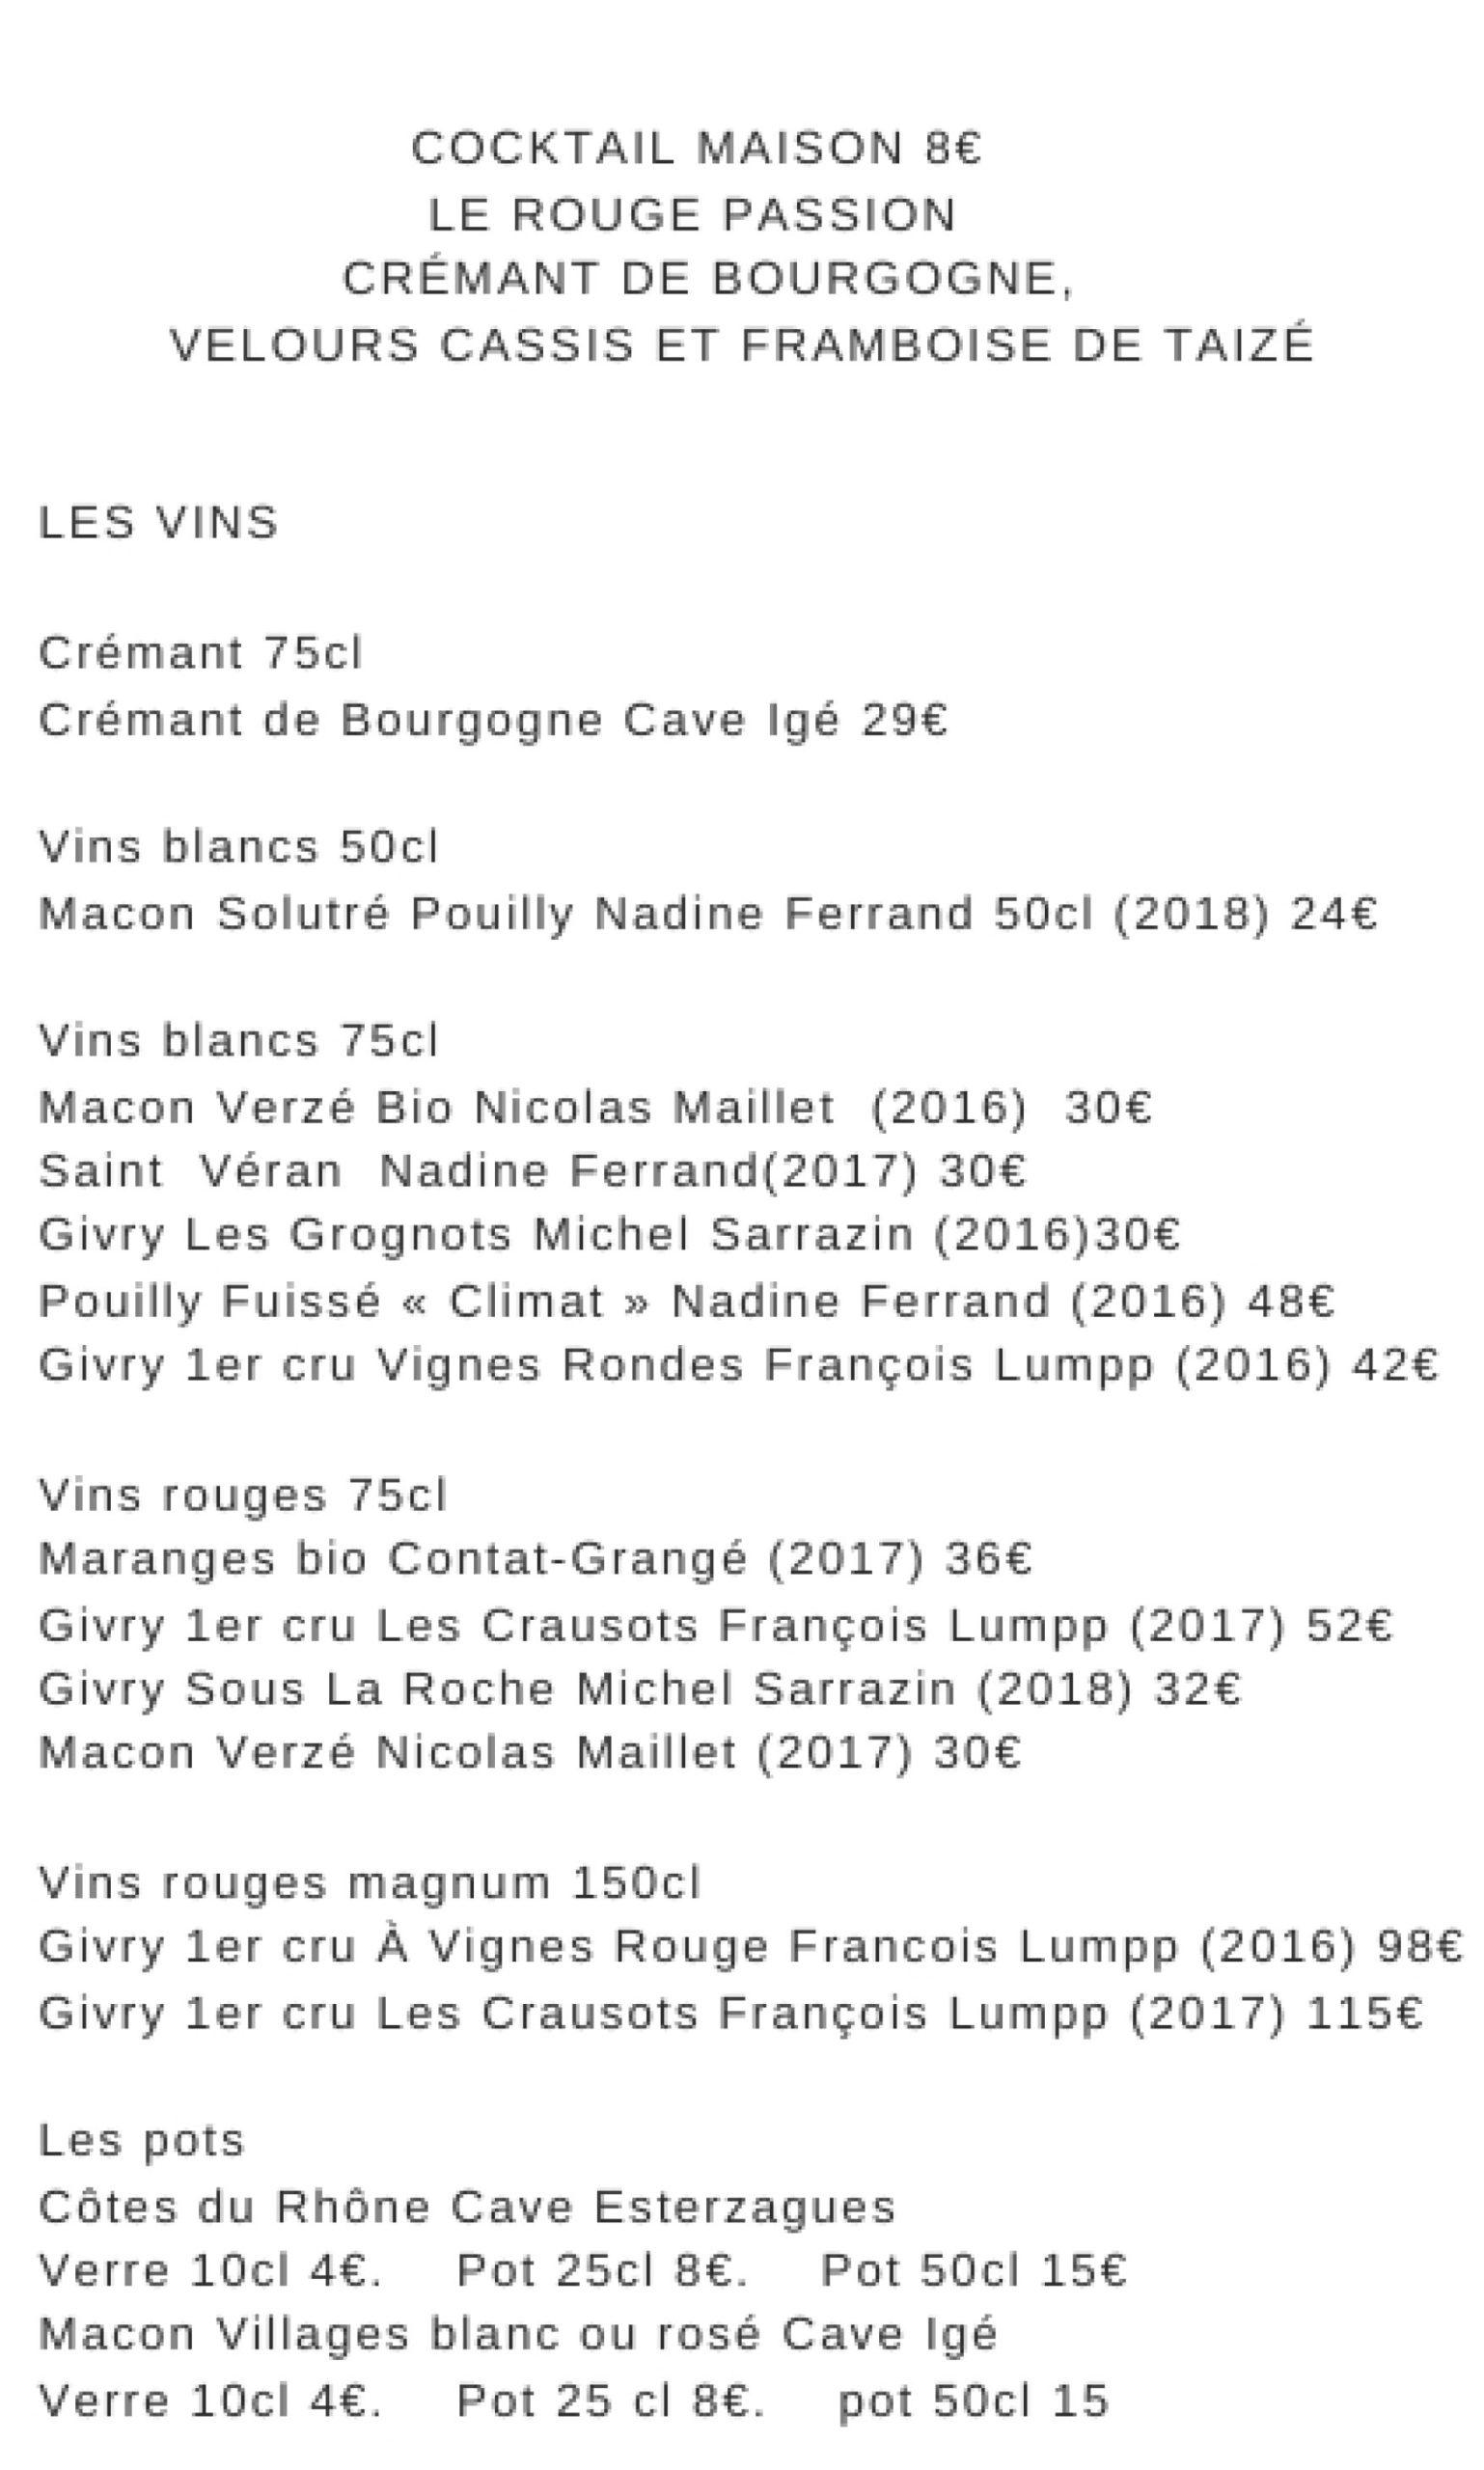 menu-halte-abbaye-arret-sur-image-4